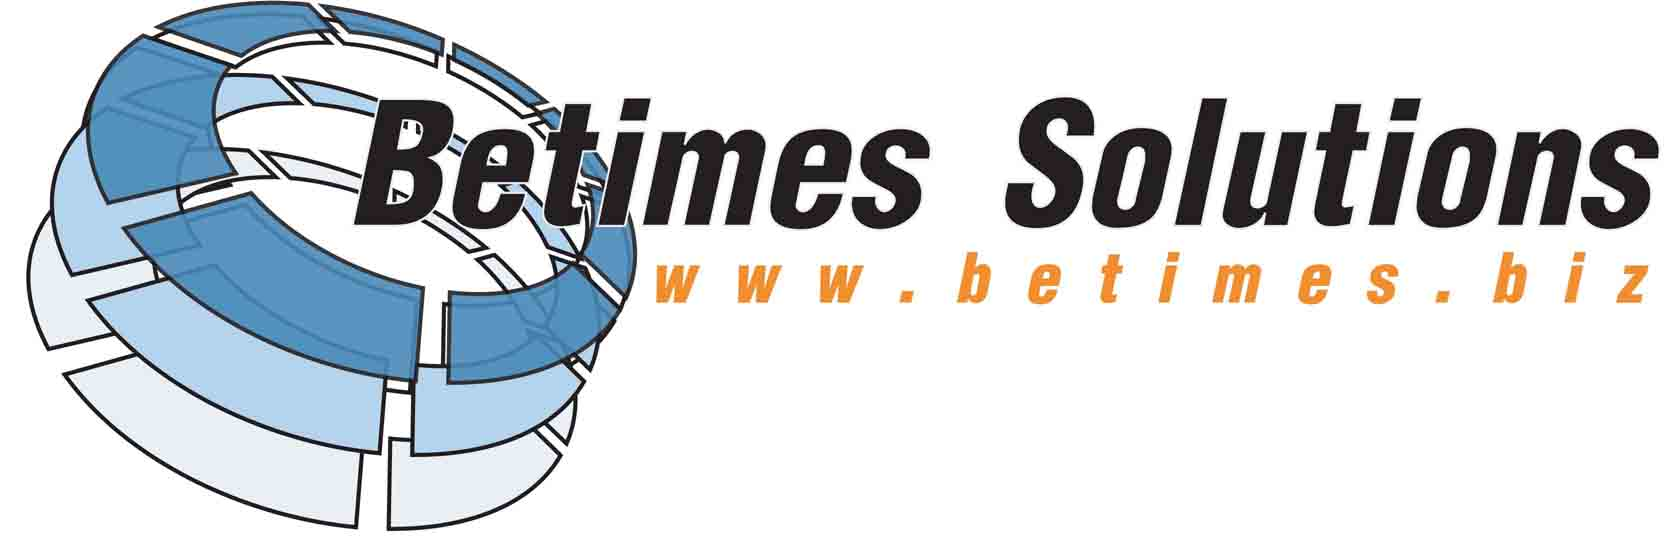 Betimes Solutions Company Ltd